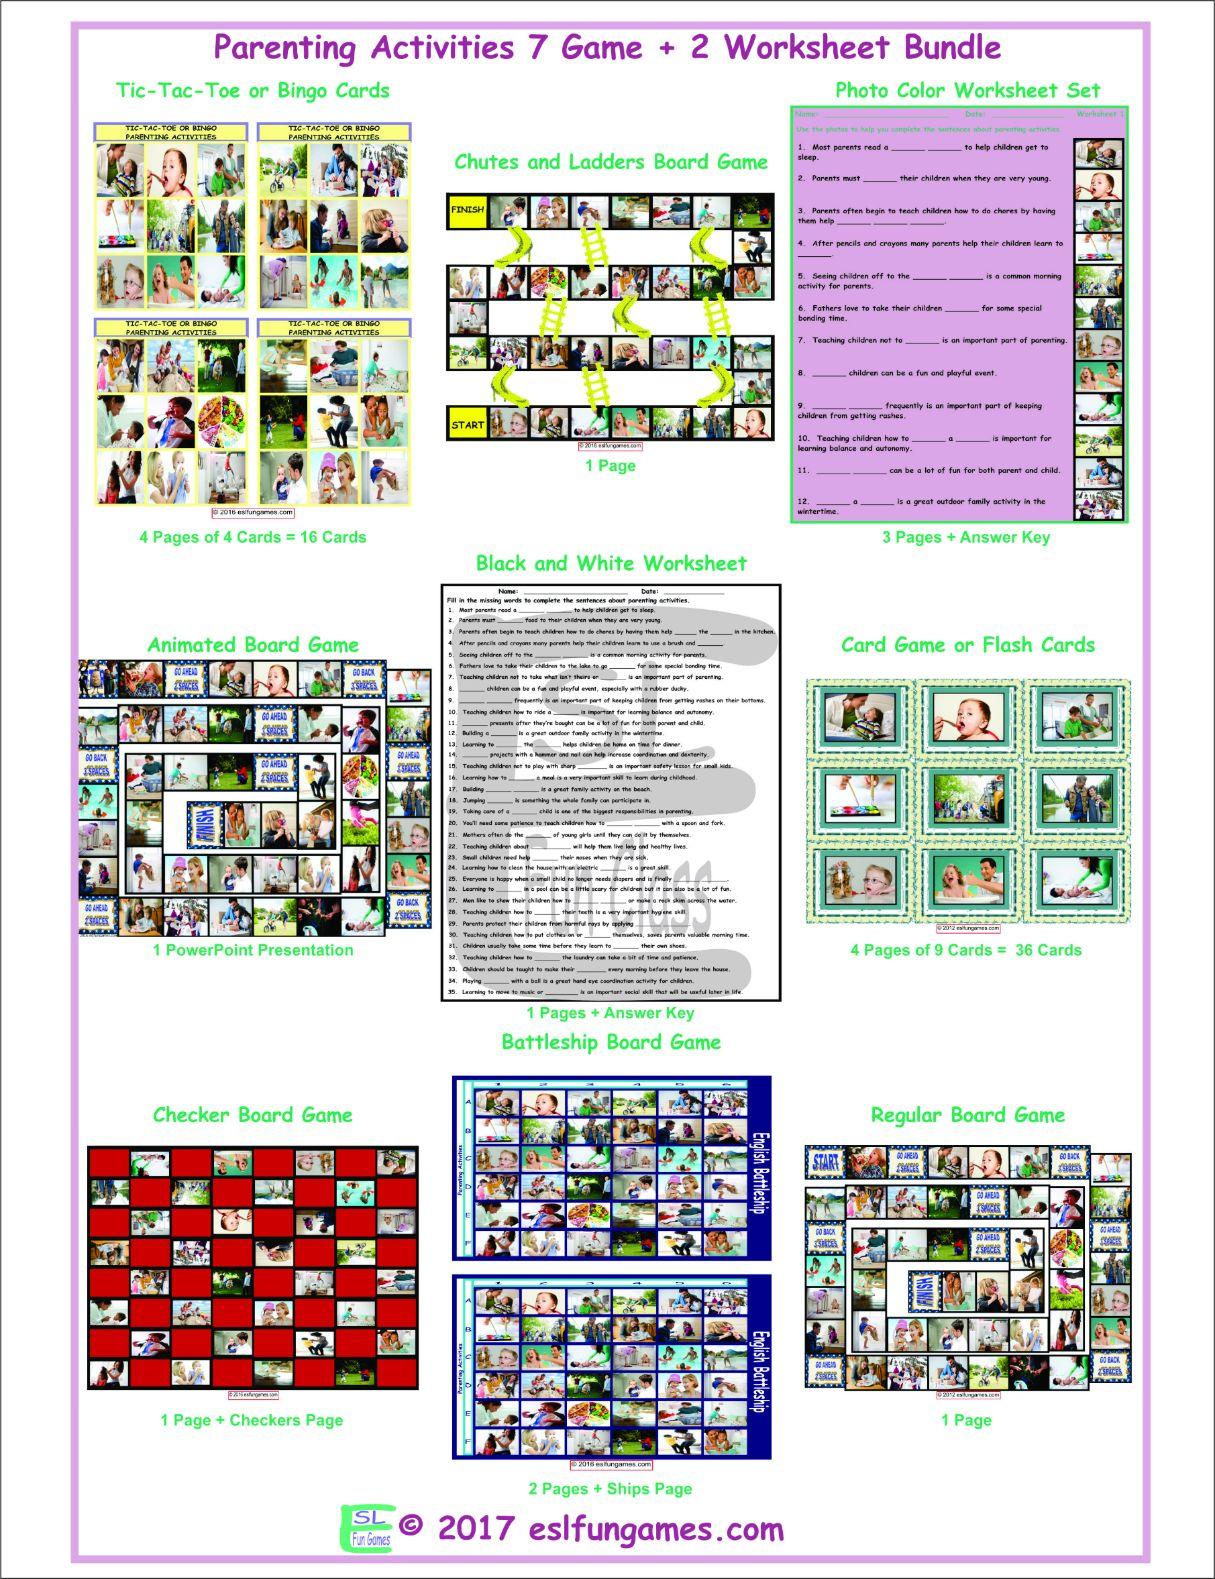 Parenting Activities 7 Game Plus 2 Worksheet Bundle